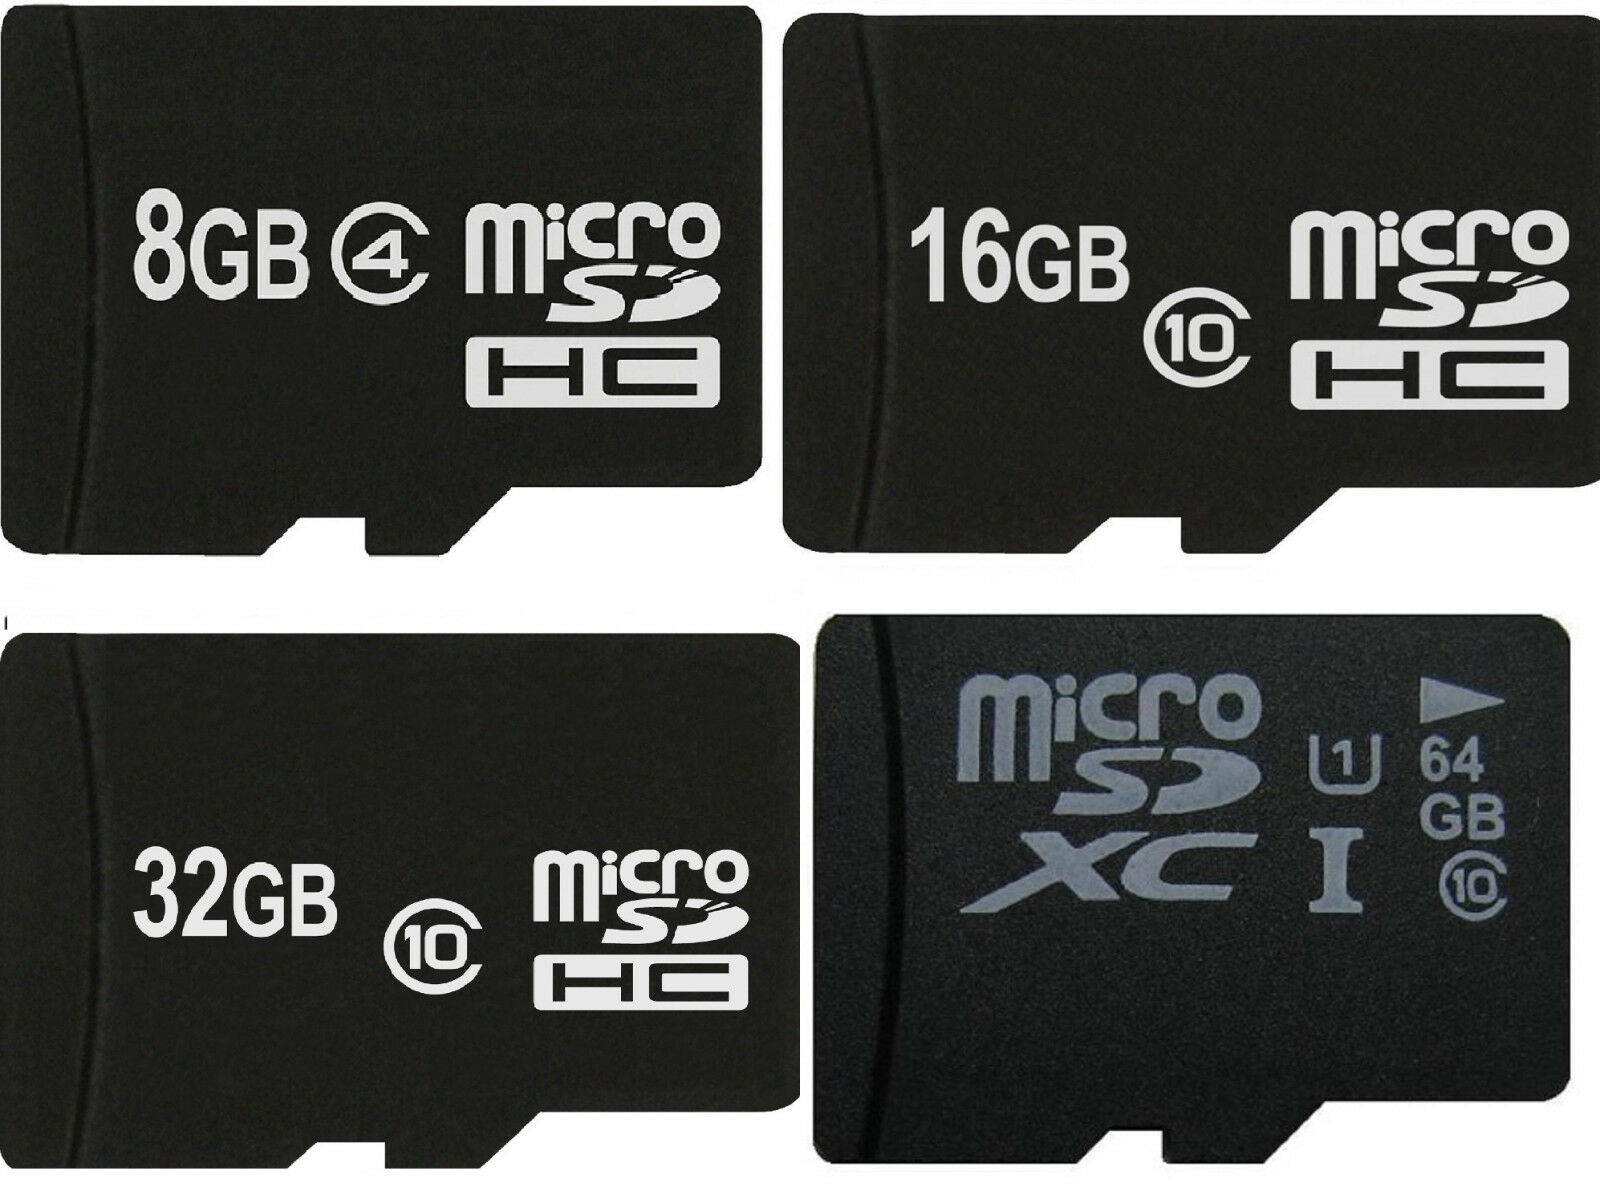 Microsdxc Karte Im Test 2018 Bestenliste Testsieger Sandisk Ultra Microsdhc Card Uhs I 16gb Class 10 98mbs Speicherkarte 8 Gb 16 32 64 Fr Handy